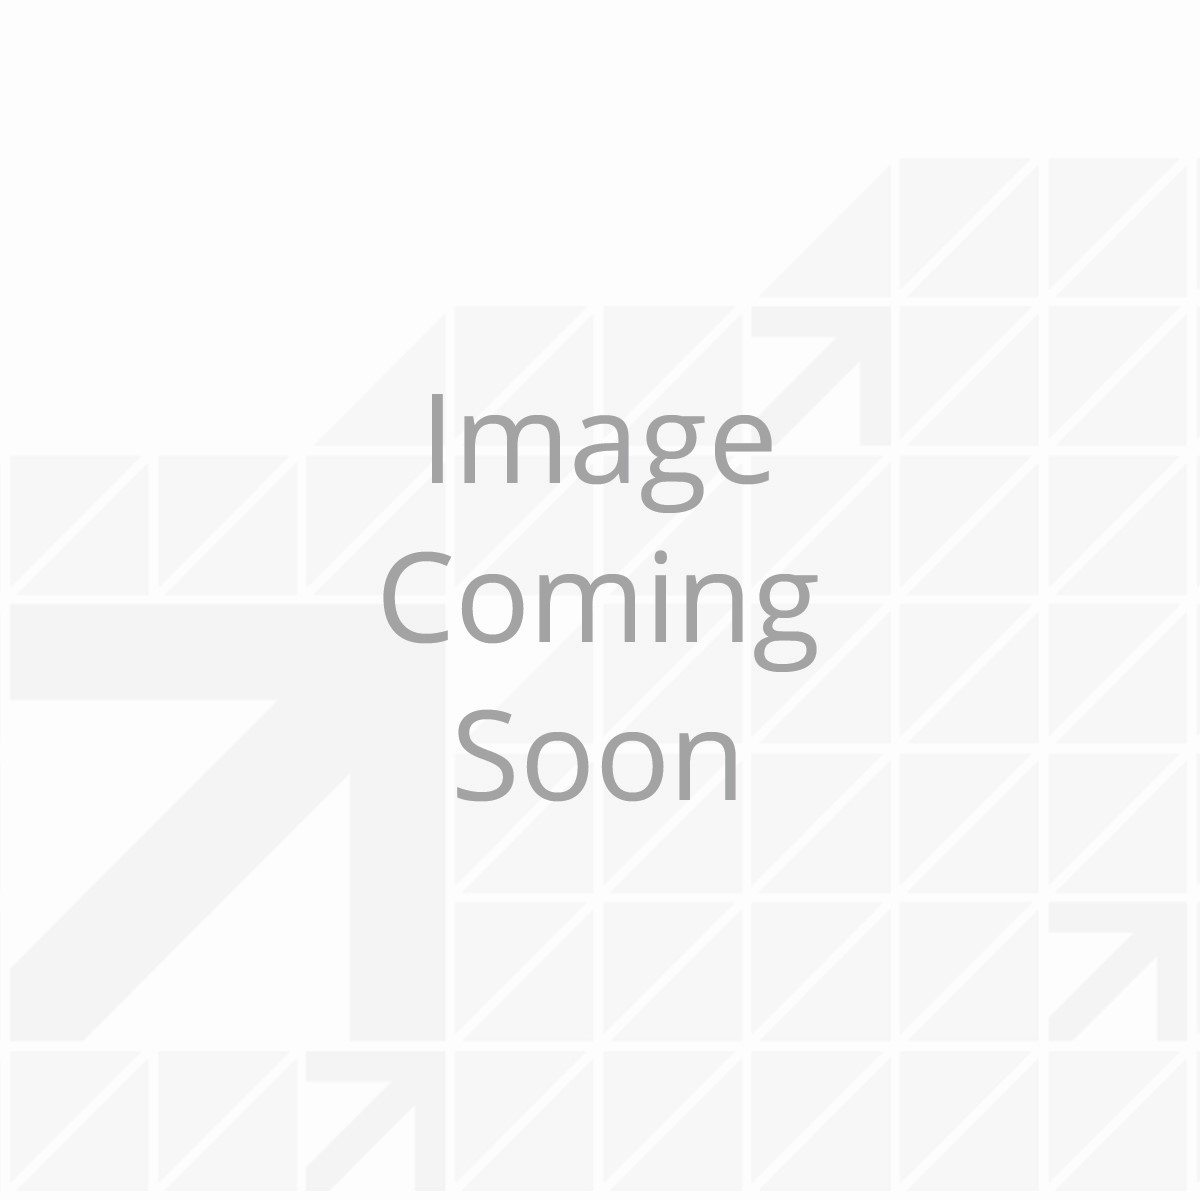 Center Point® Air Ride Suspension - Triple Axle Configuration